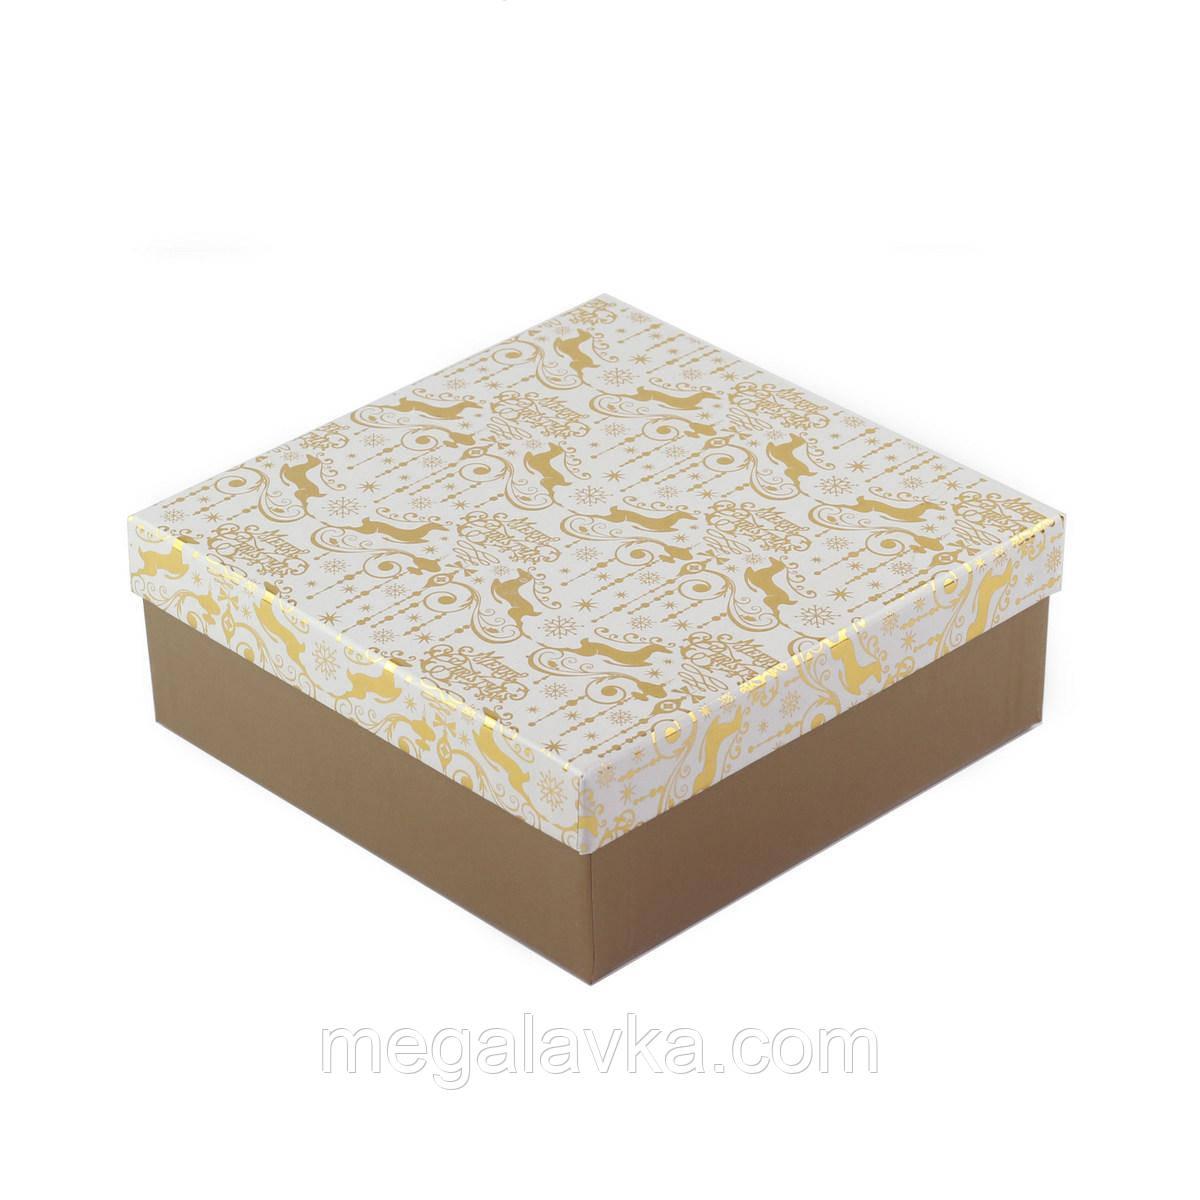 Коробка подарочная Gold 18 х 18 х 8 см